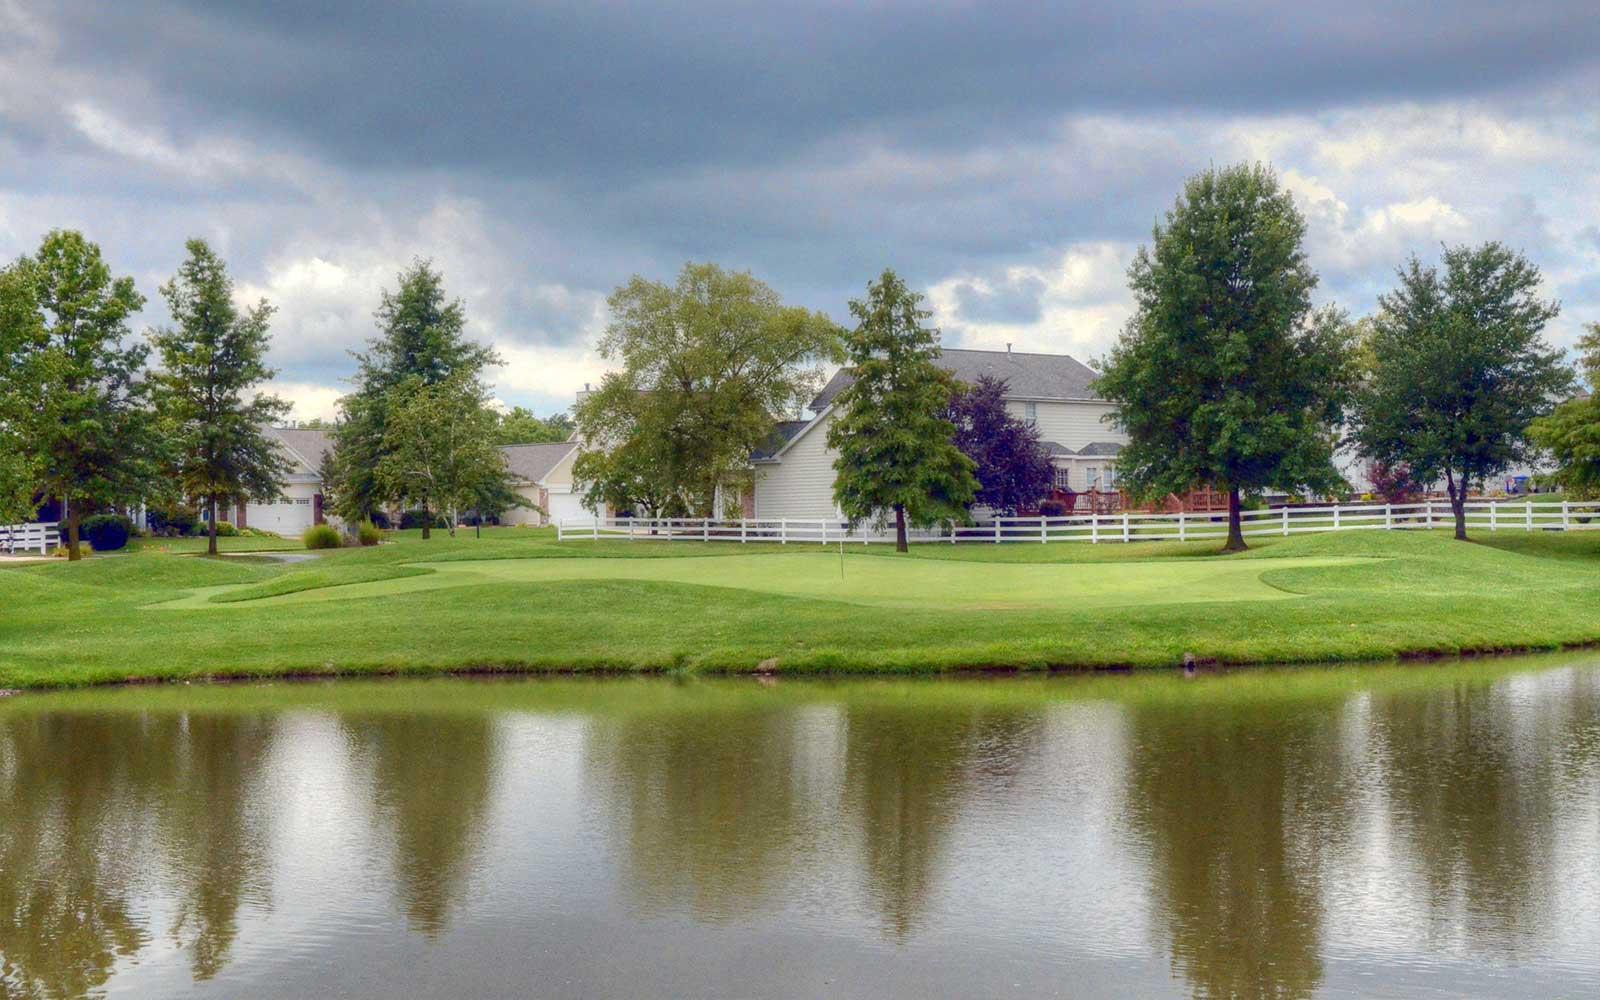 The-Falls-Golf-Club,-O'Fallon,-MO-Reflection